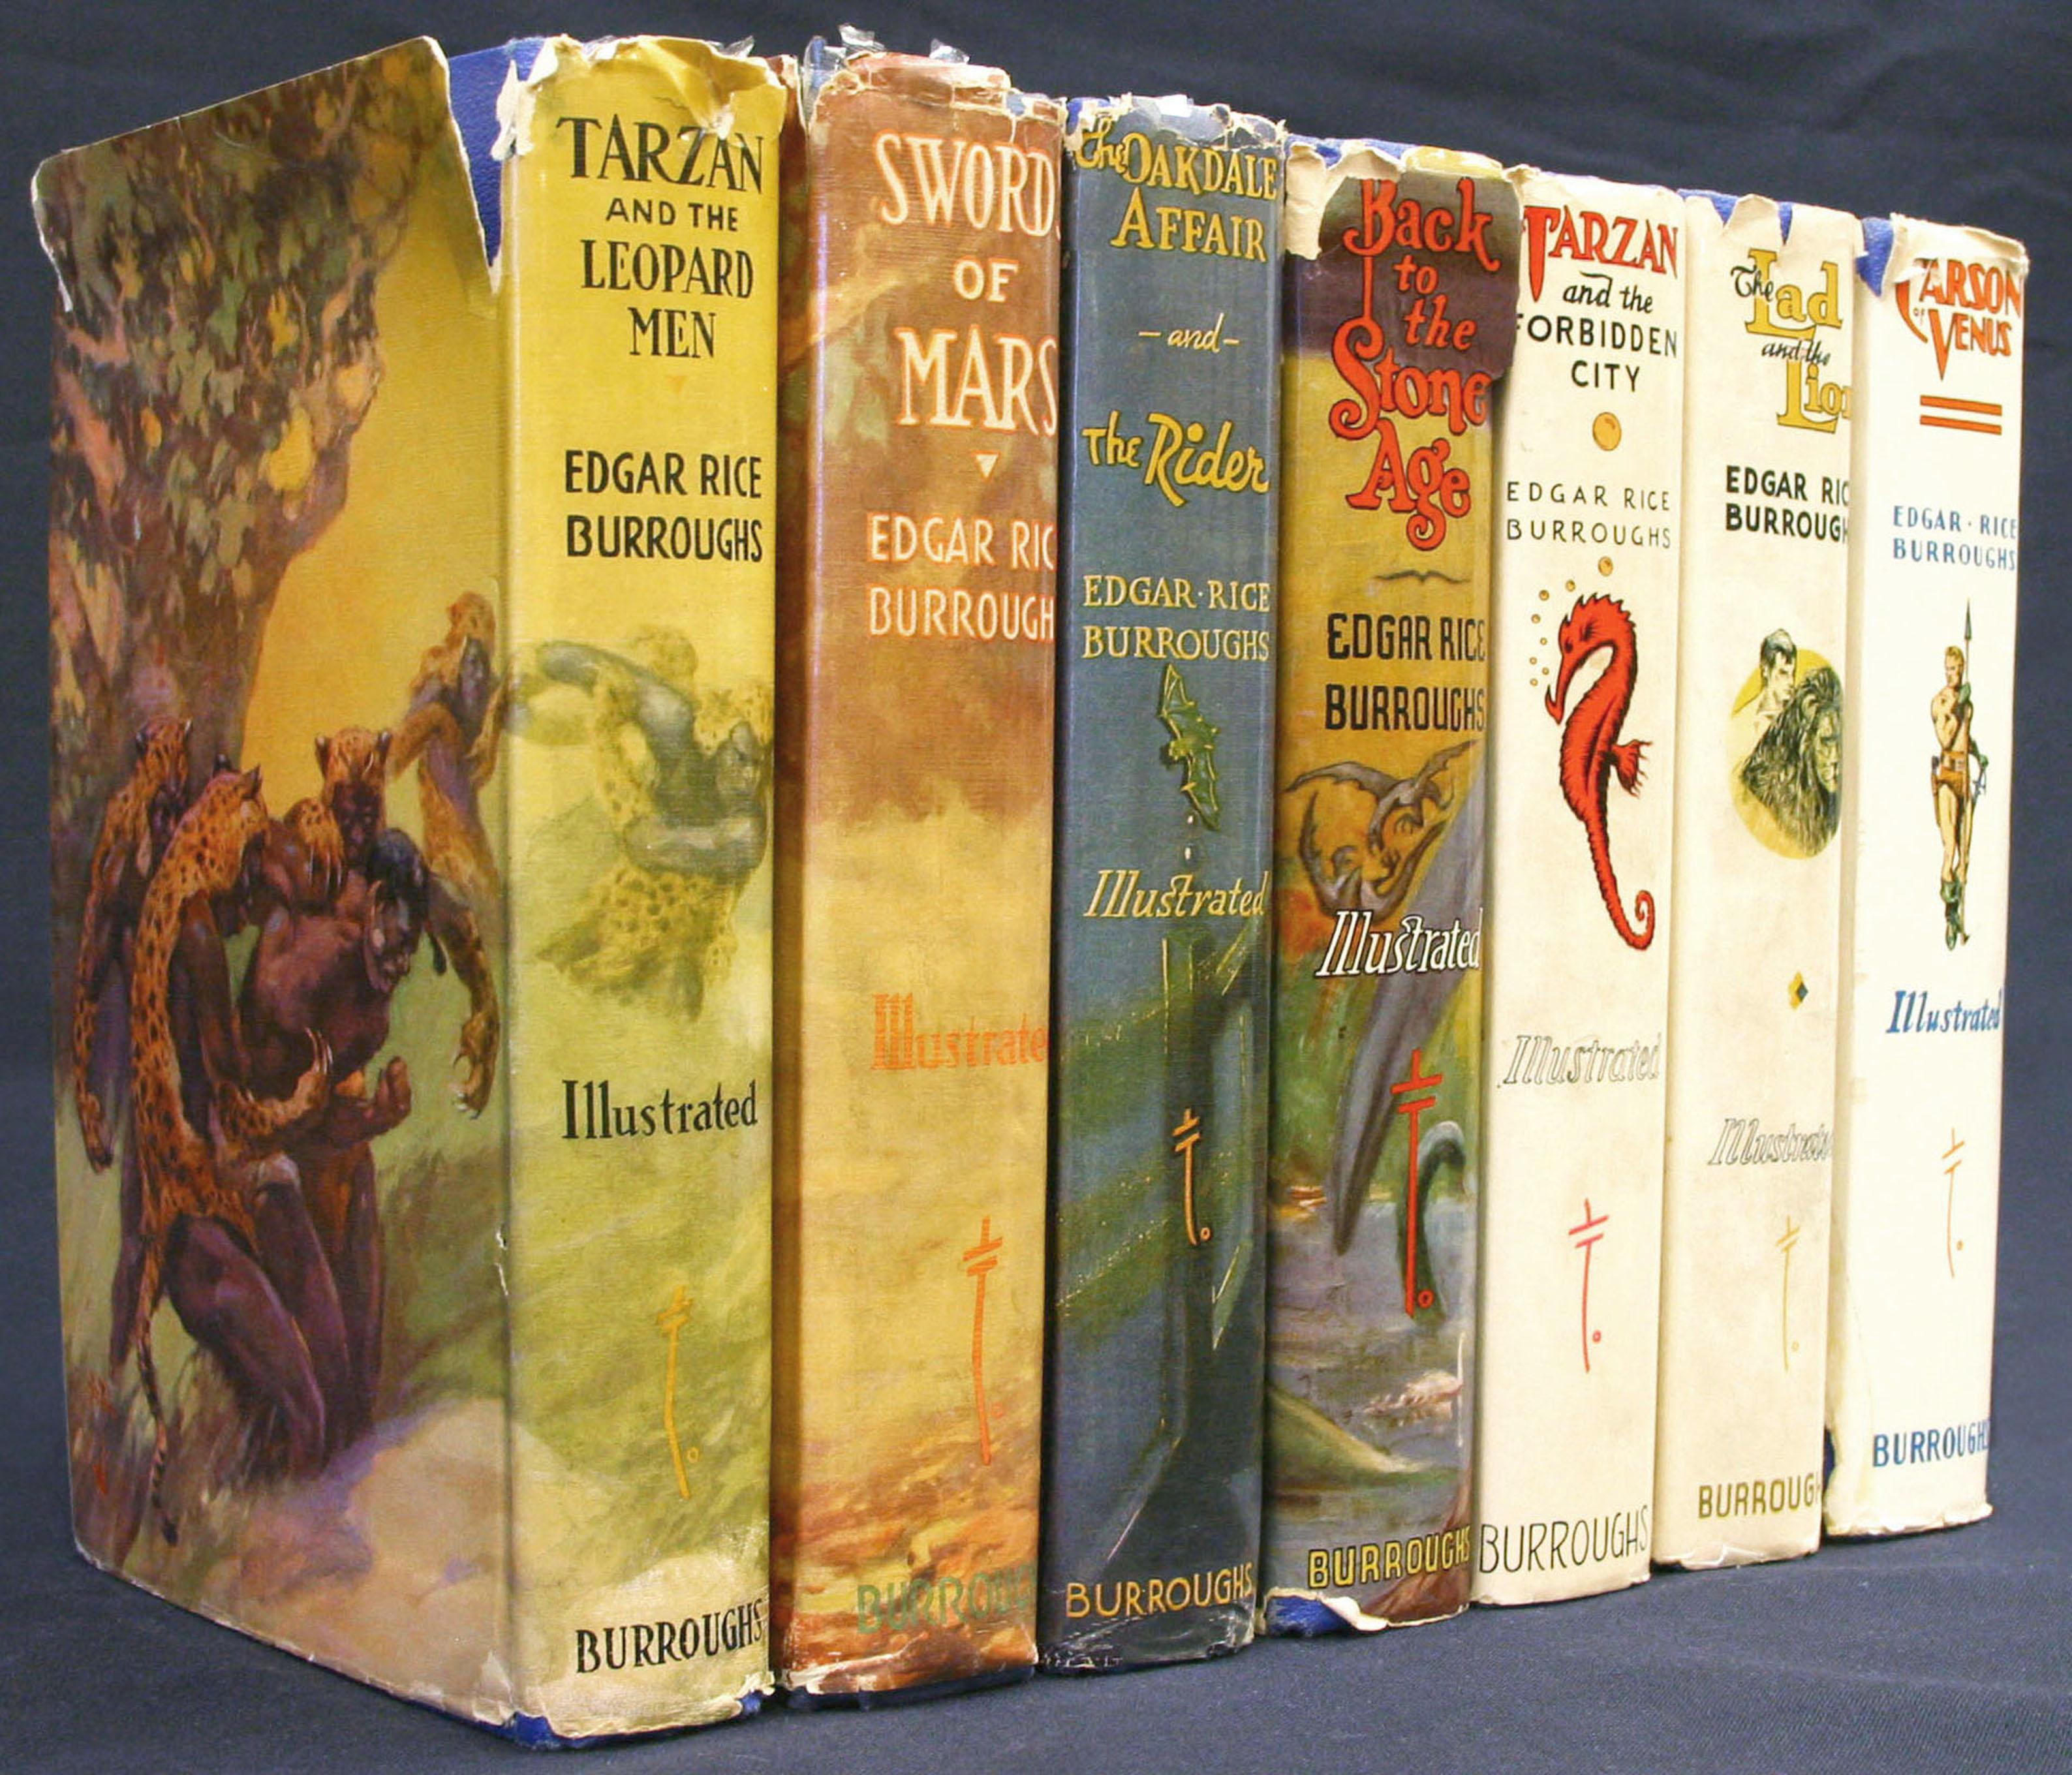 Order of Edgar Rice Burroughs Books